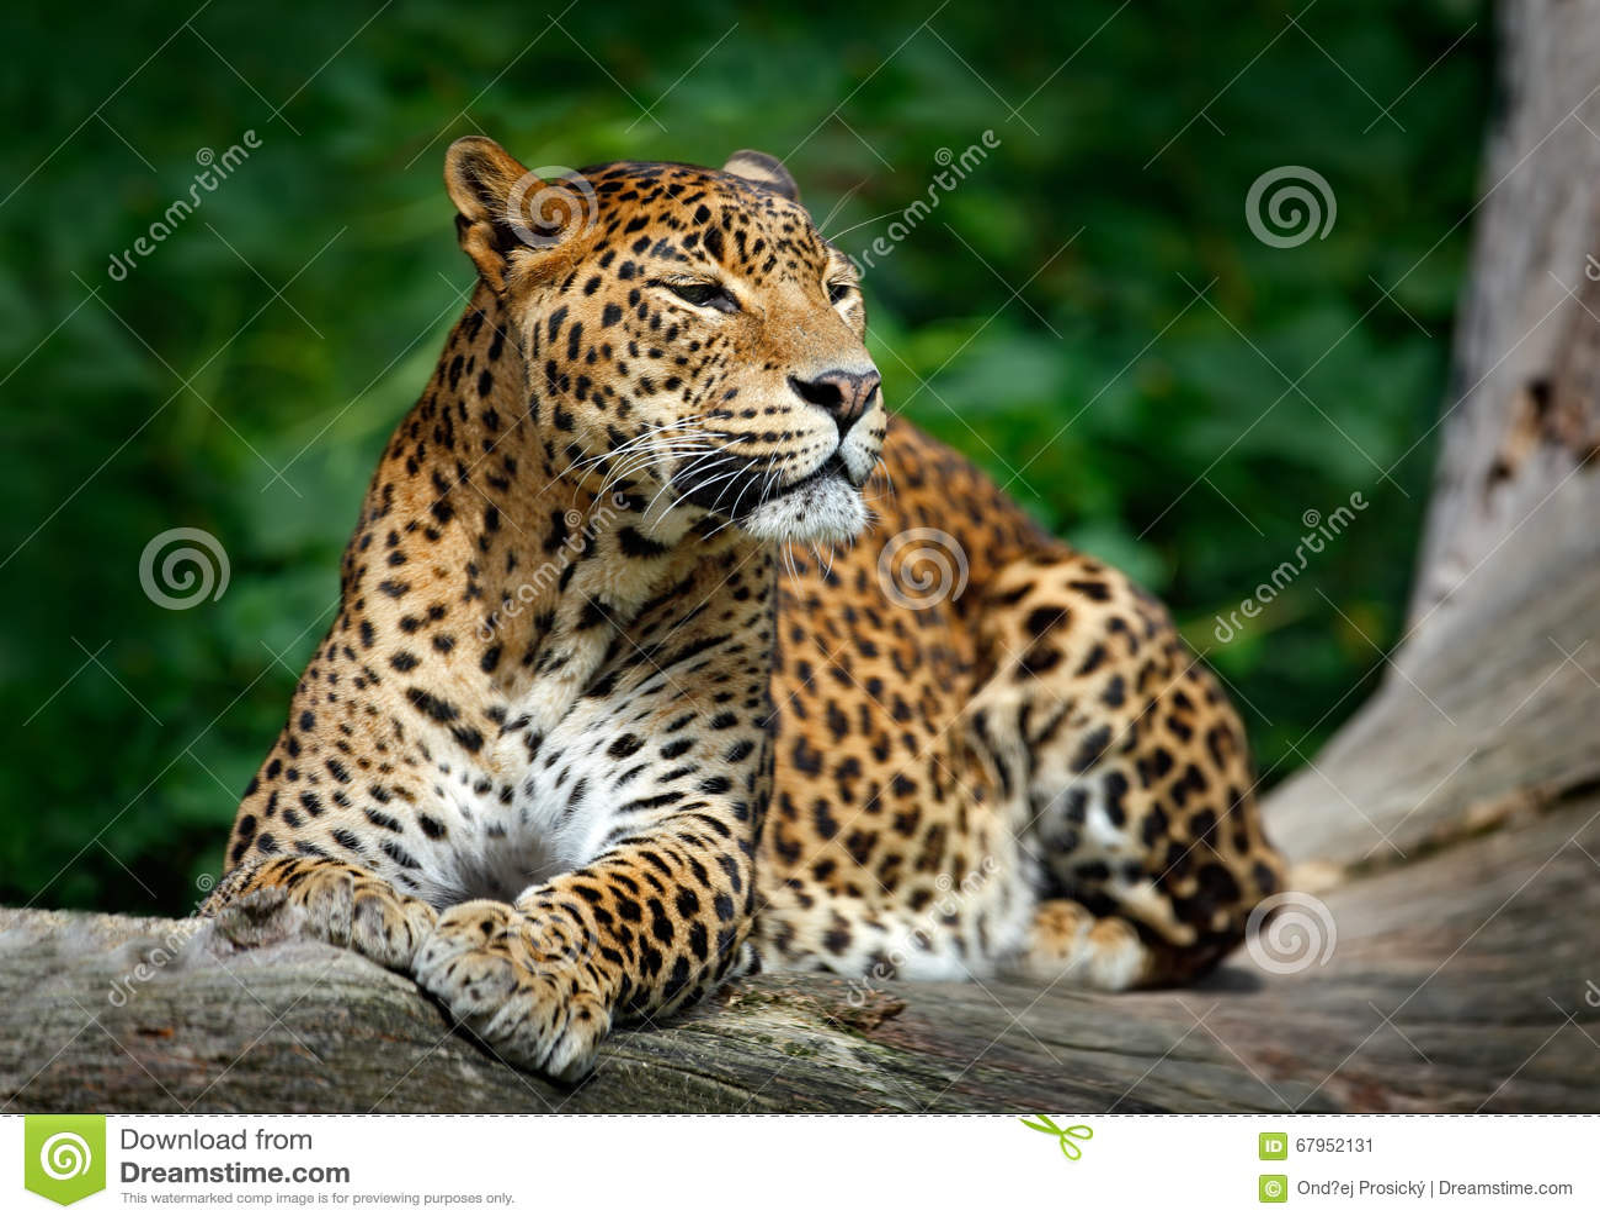 Srilankesisk leopard, Pantheraparduskotiya, stor prickig katt som ligger på trädet i naturlivsmiljön, Yala nationalpark, Sri Lank